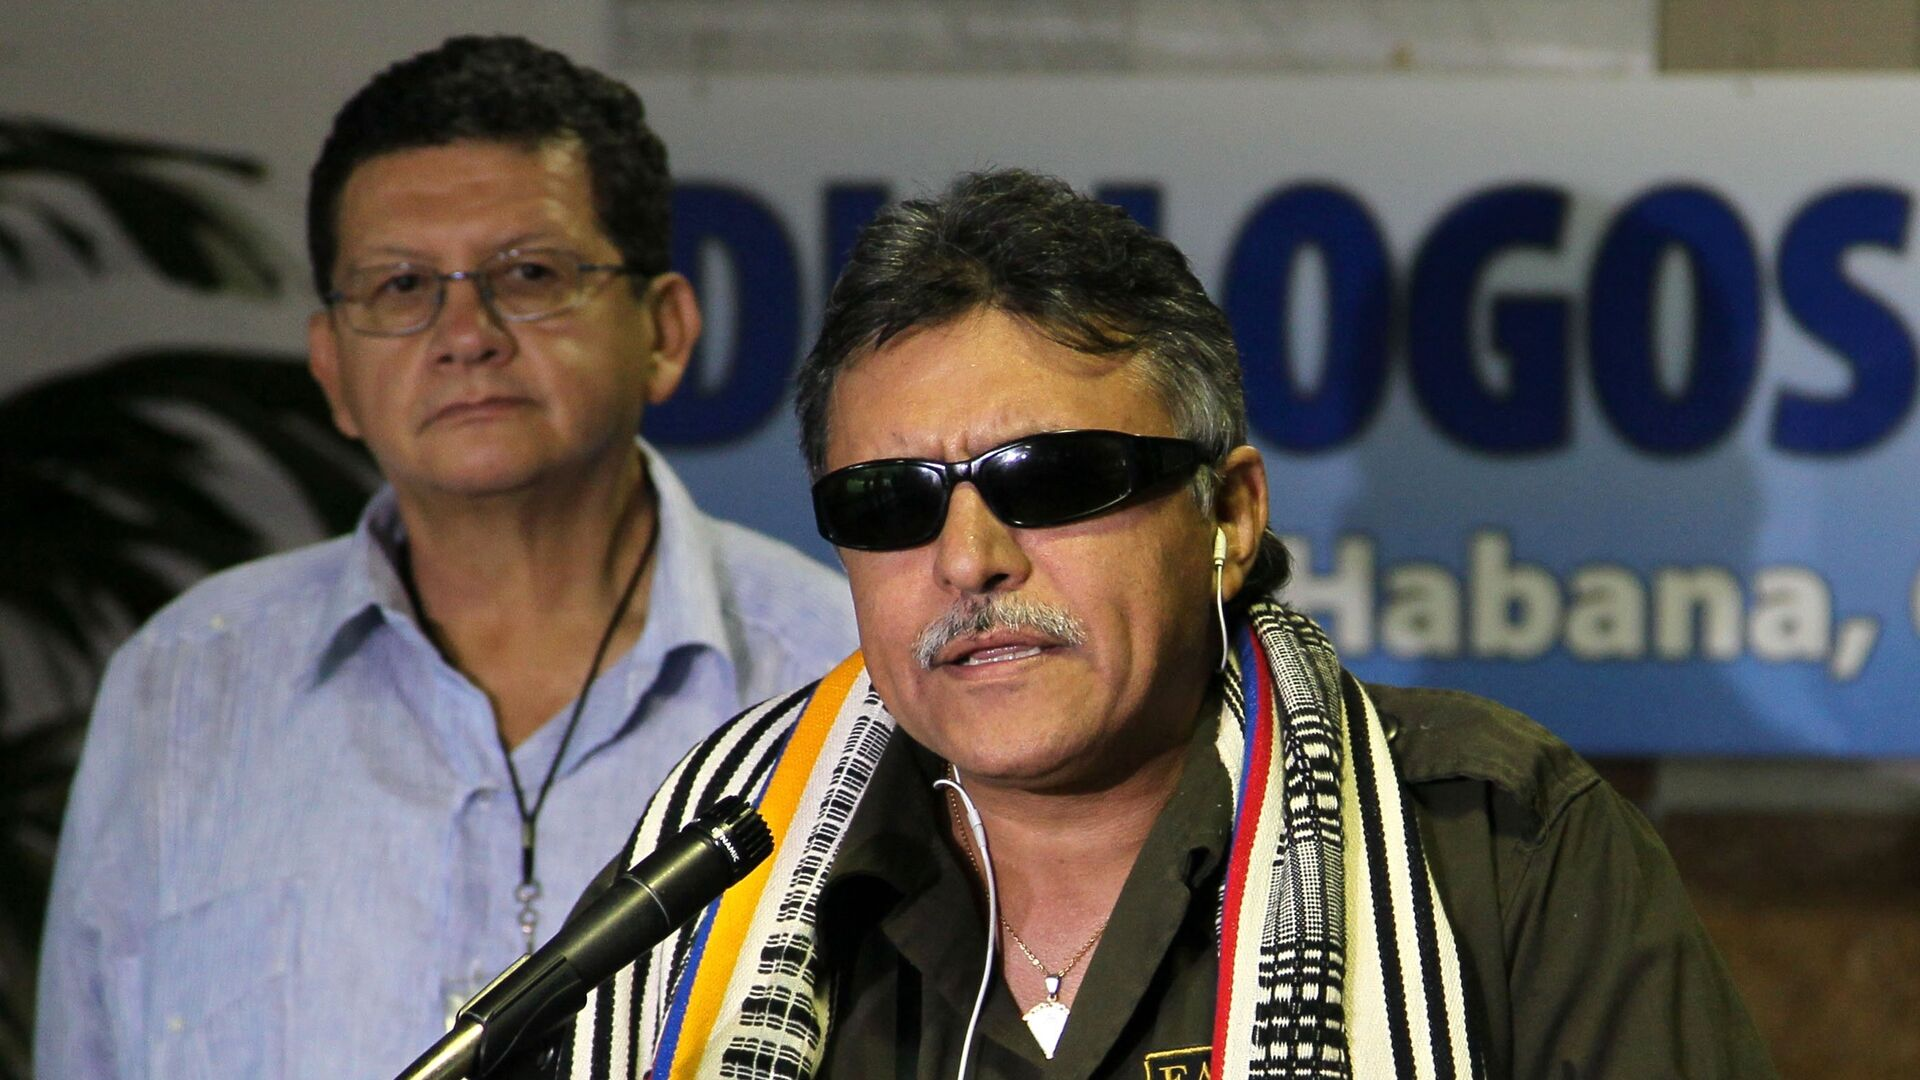 Jesús Santrich, exguerrillero colombiano, integrante del partido político FARC - Sputnik Mundo, 1920, 24.02.2021